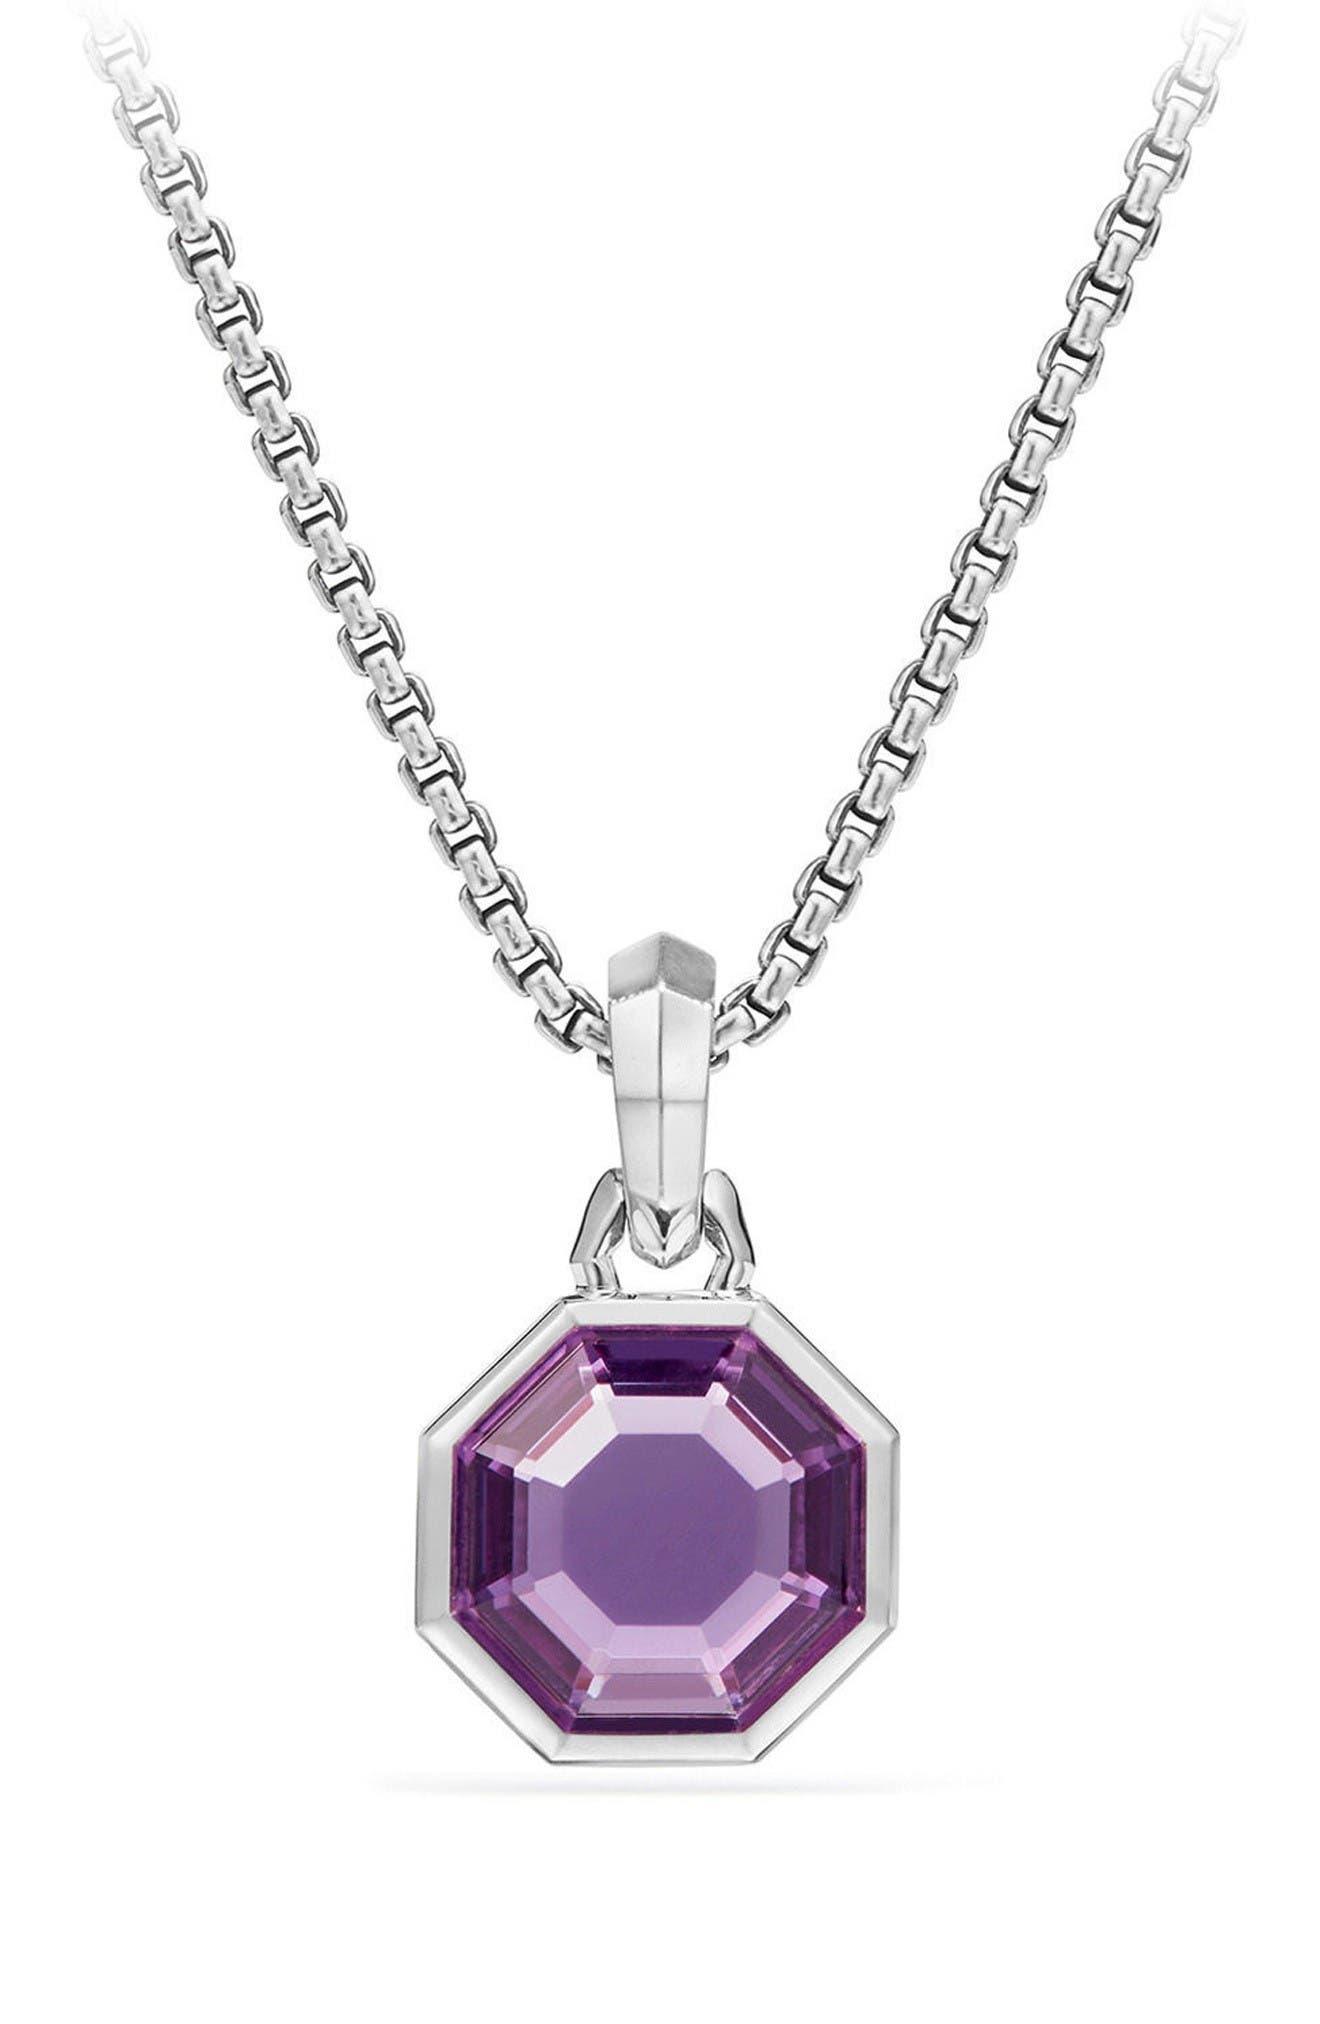 David Yurman Cable Collectibles Octagon Cut Semiprecious Stone Amulet